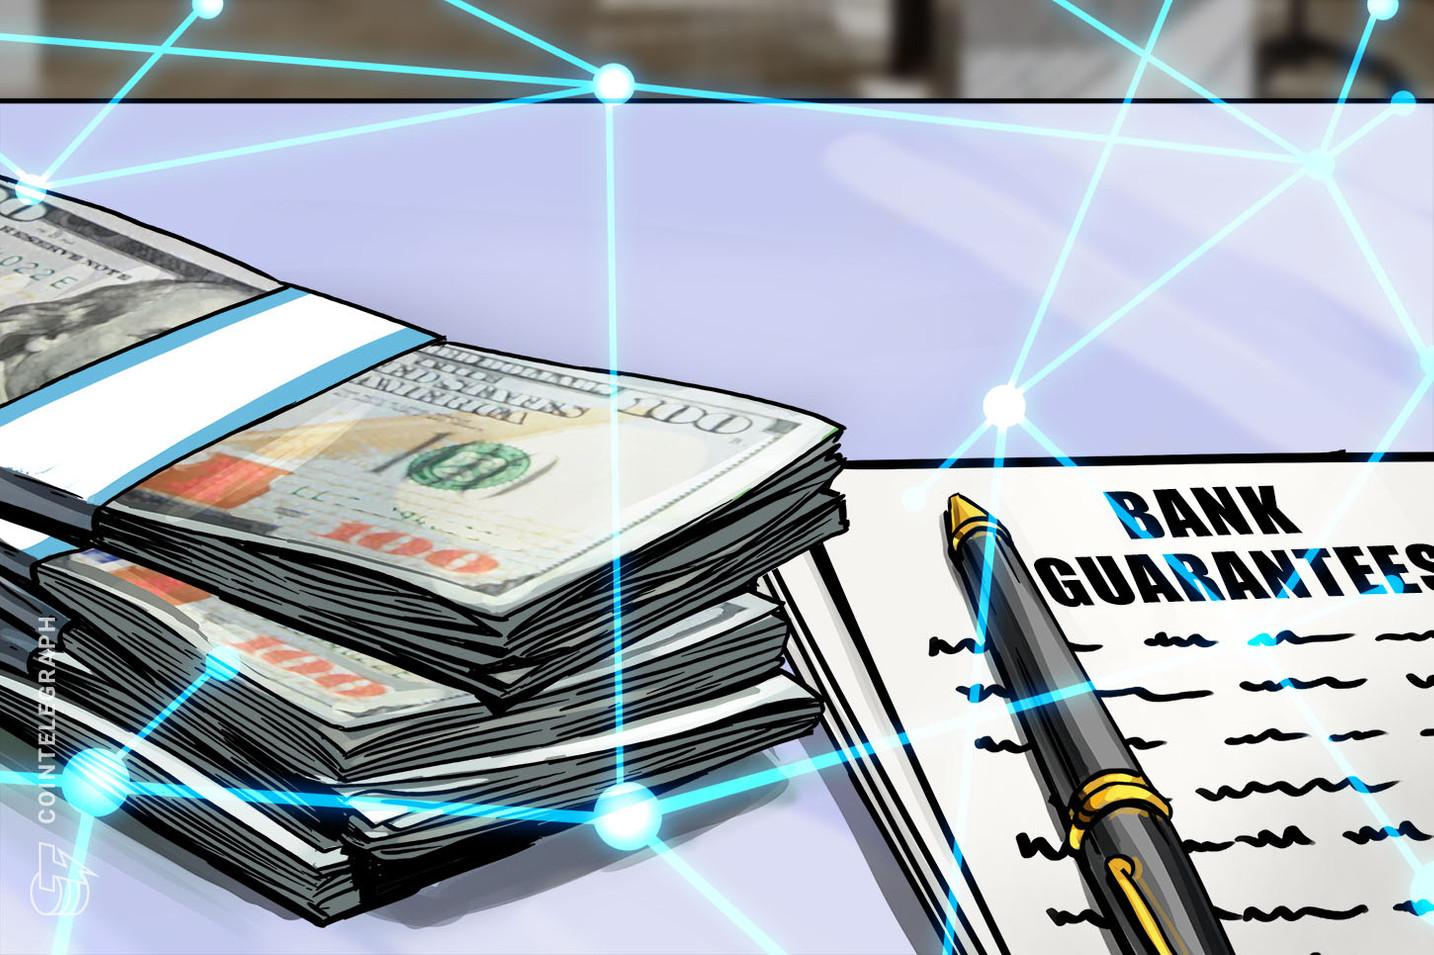 IBM Launches Blockchain Pilot for Bank Guarantee Processes